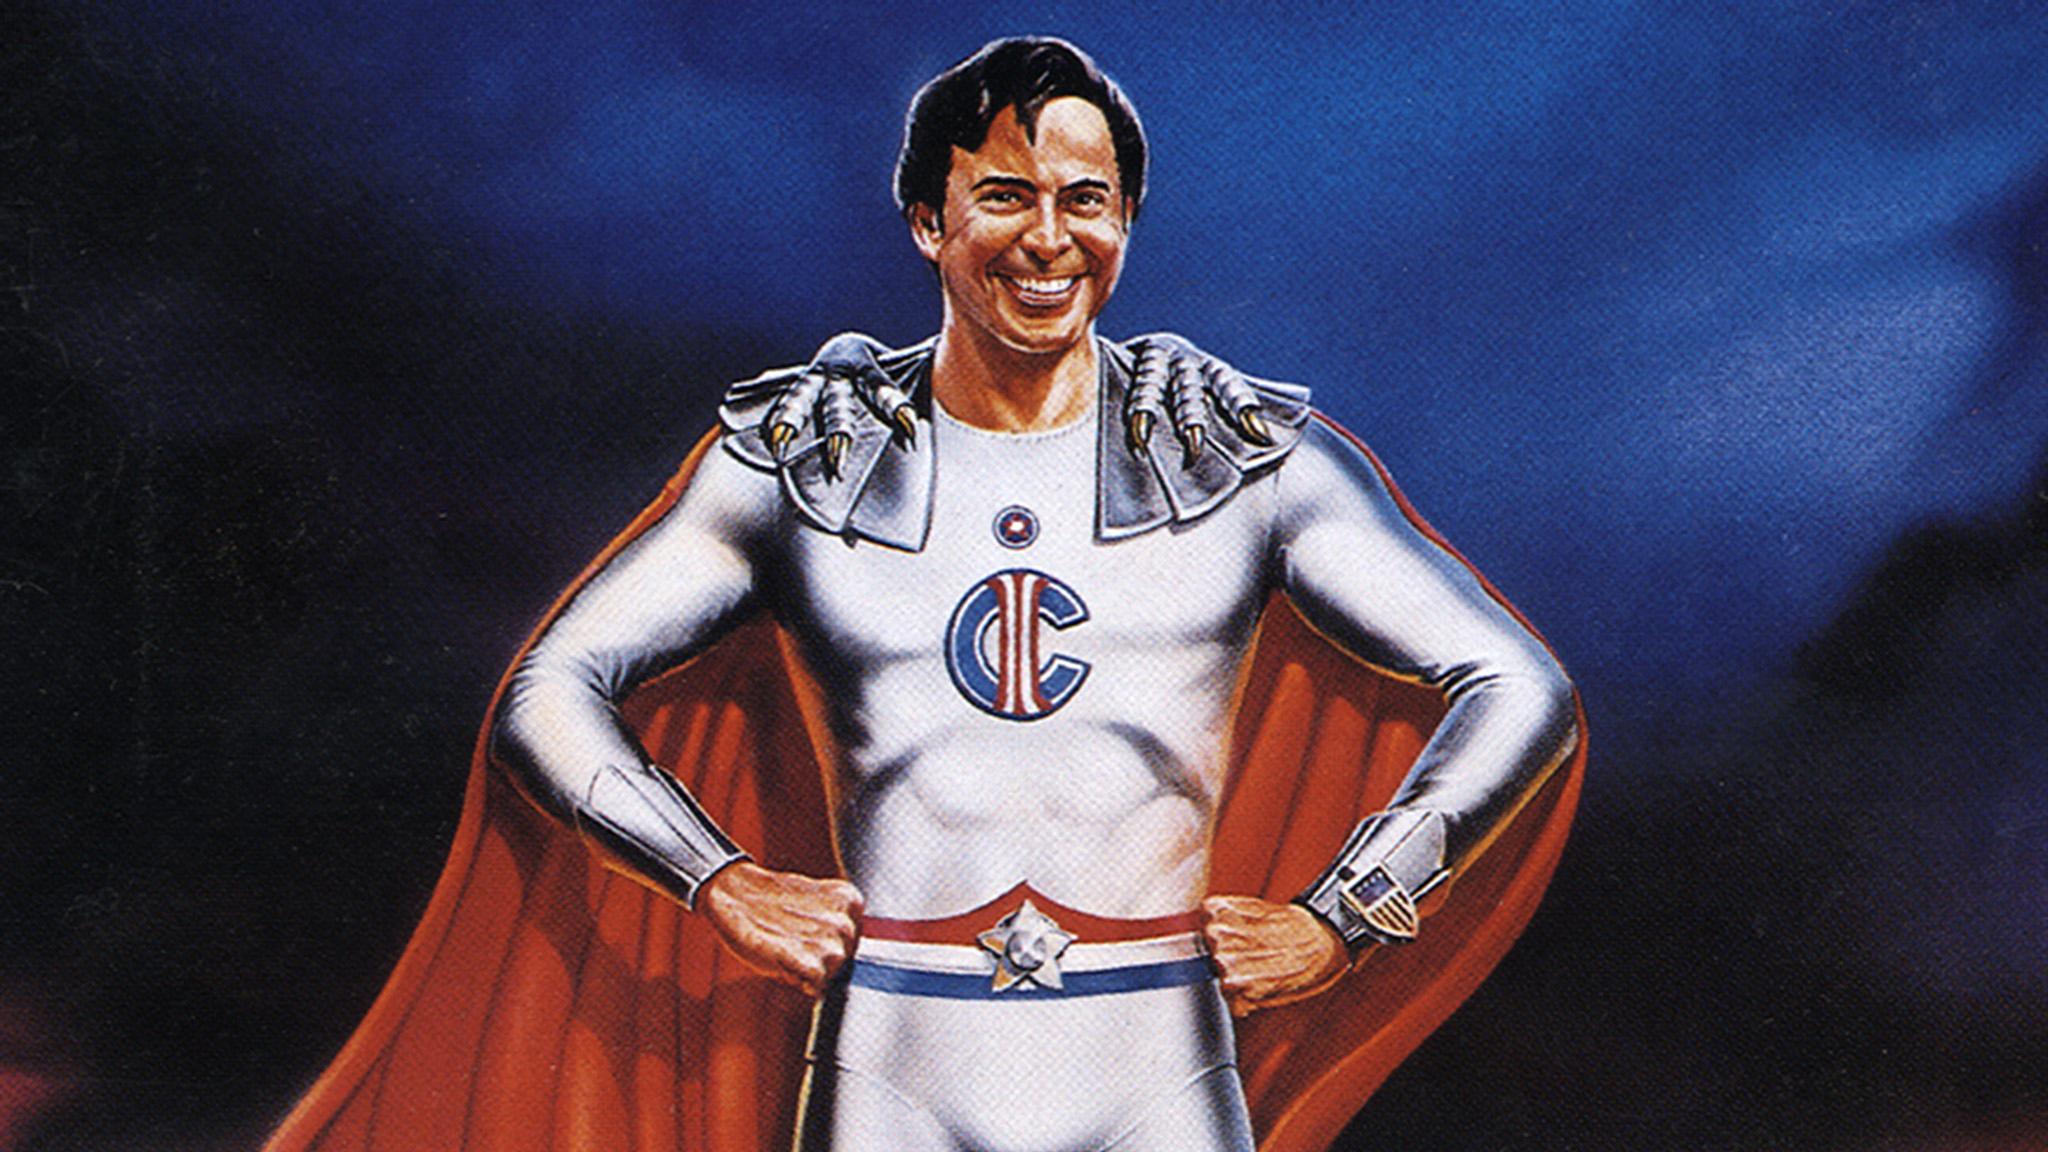 1983: 'The Return of Captain Invincible'